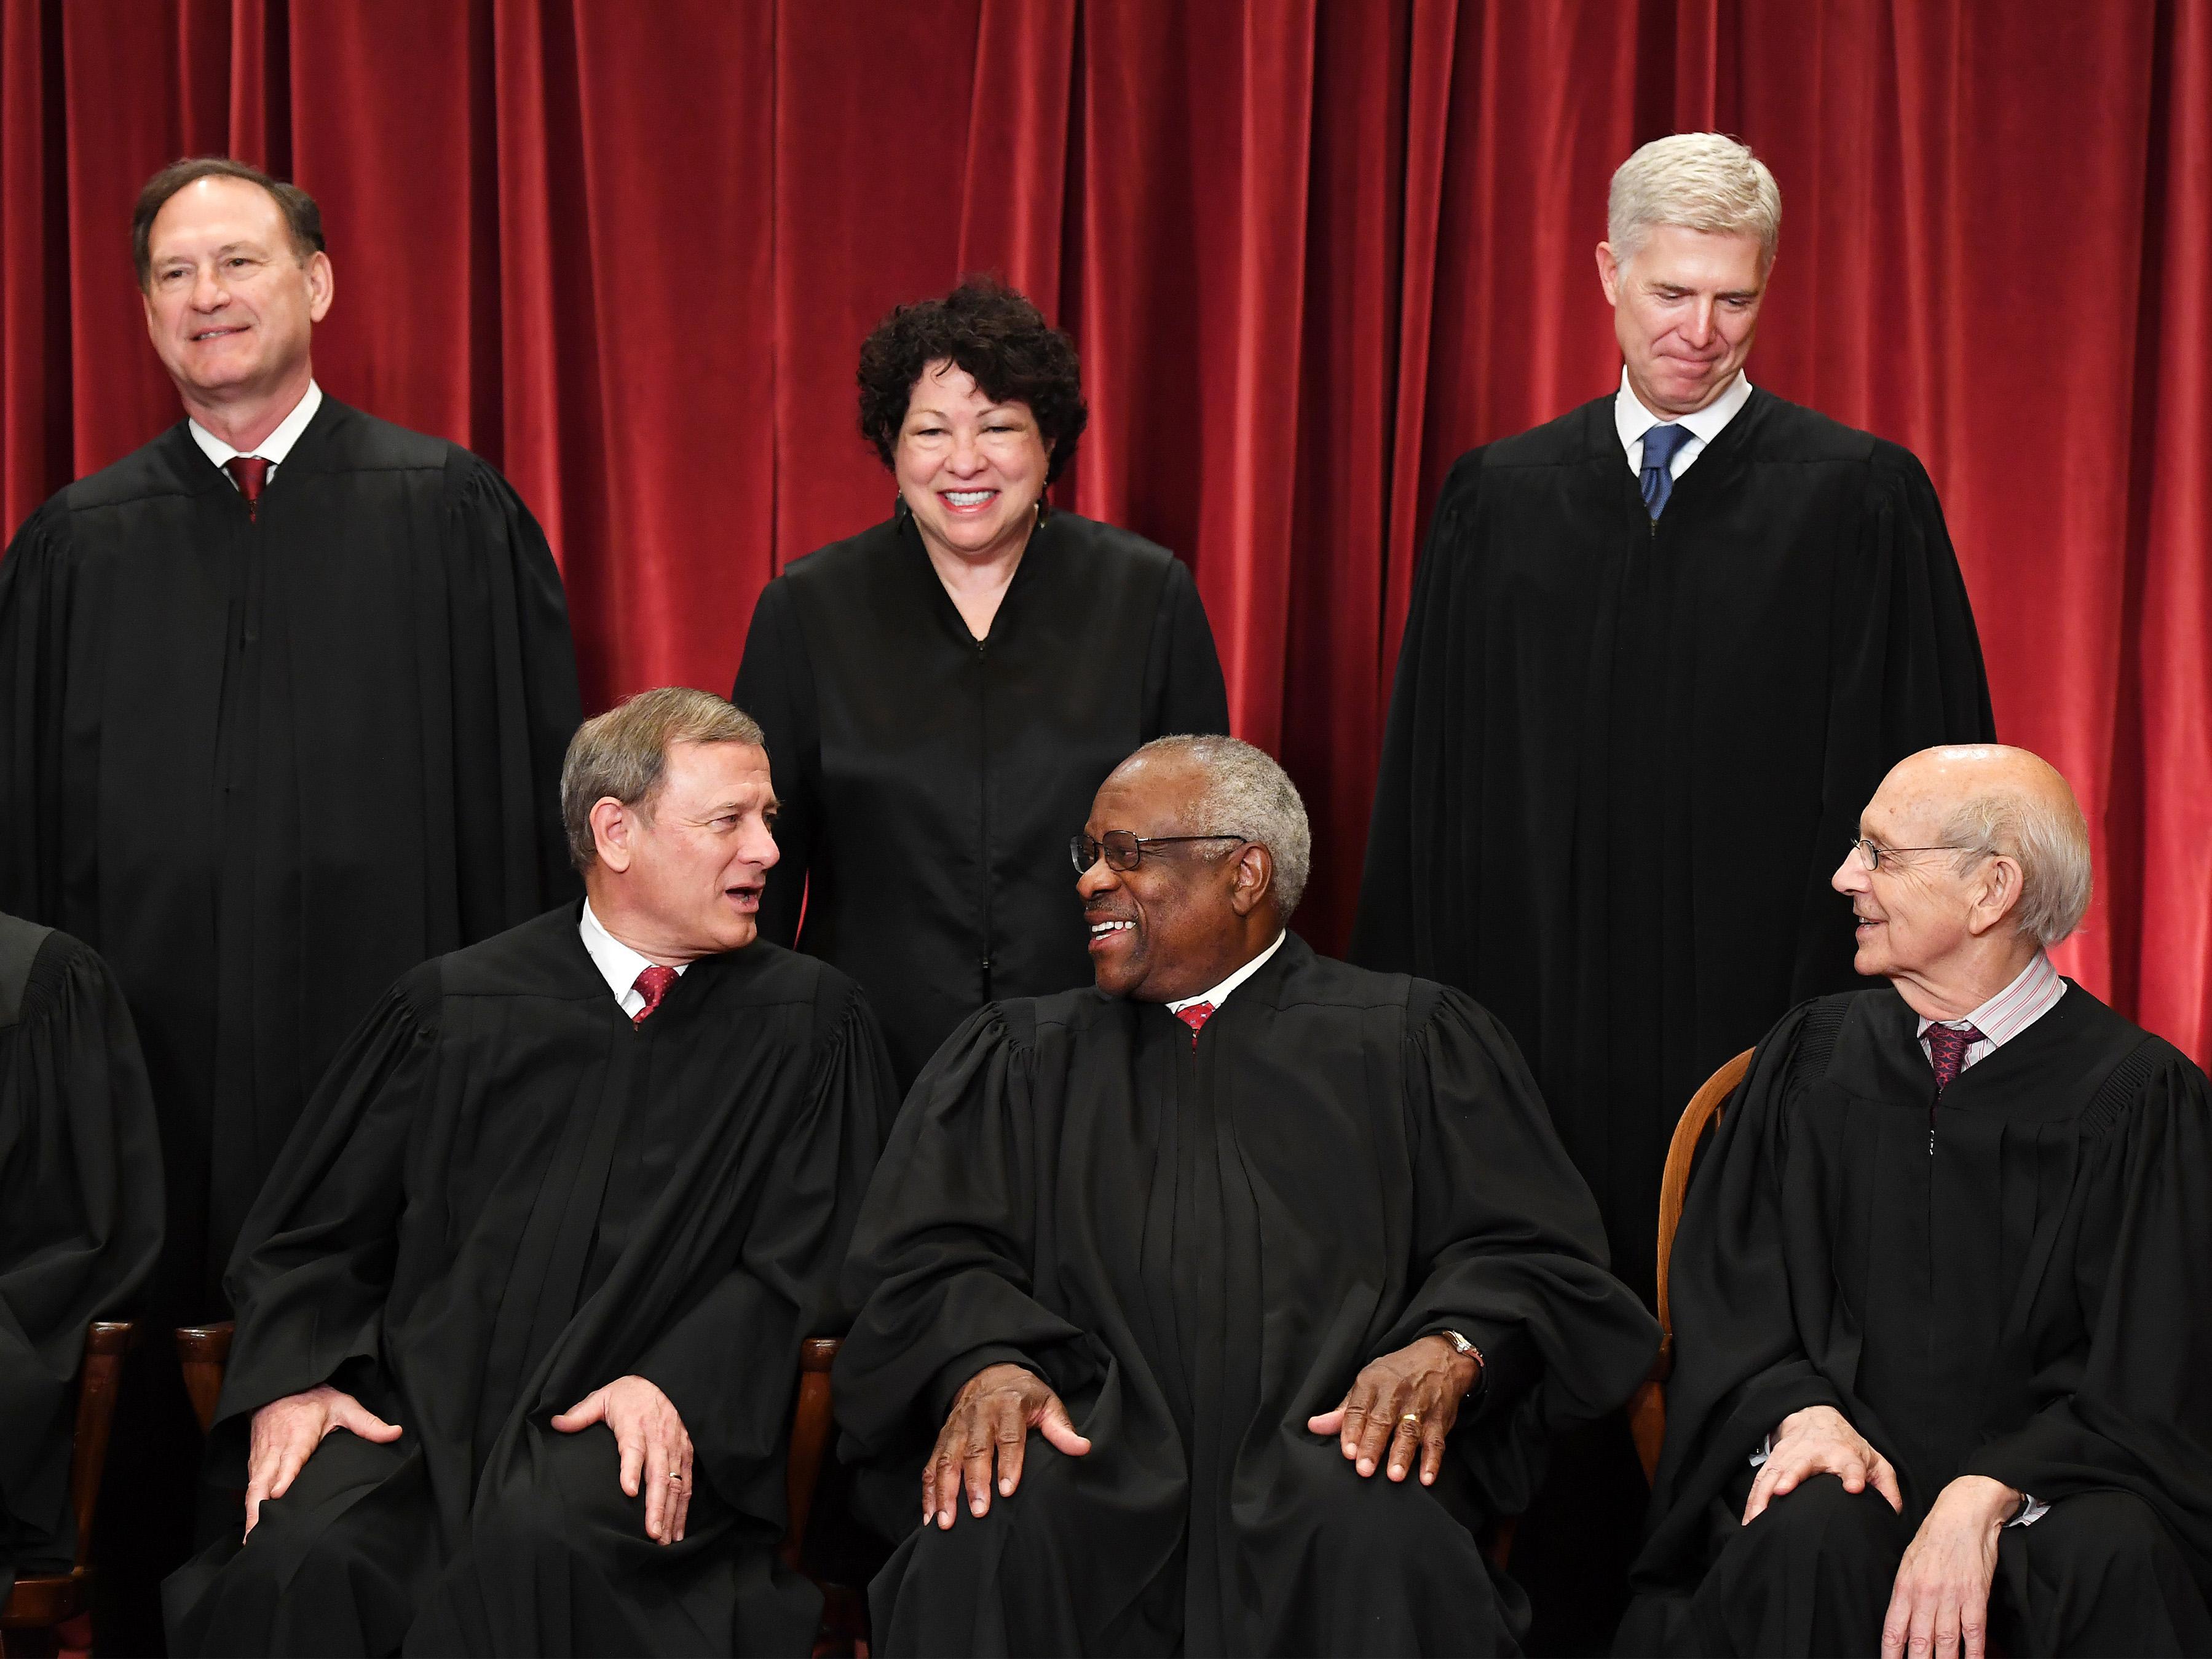 U.S. Supreme Court portrait – Washington, DC